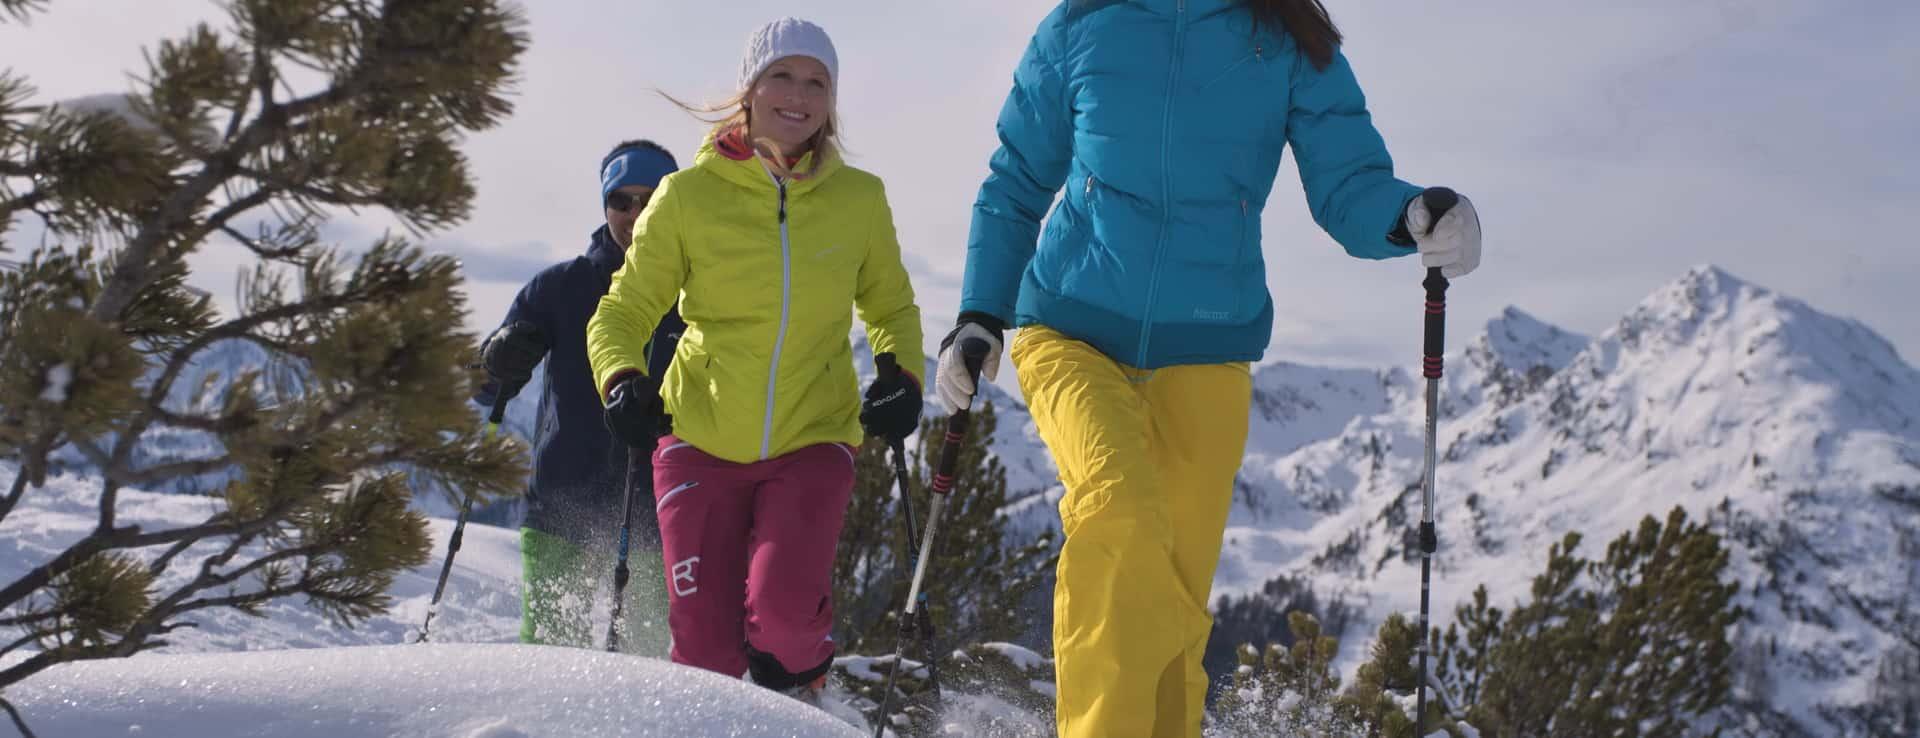 Snöskovandring Schladming Dachstein Grupp konferens semester i Österrike